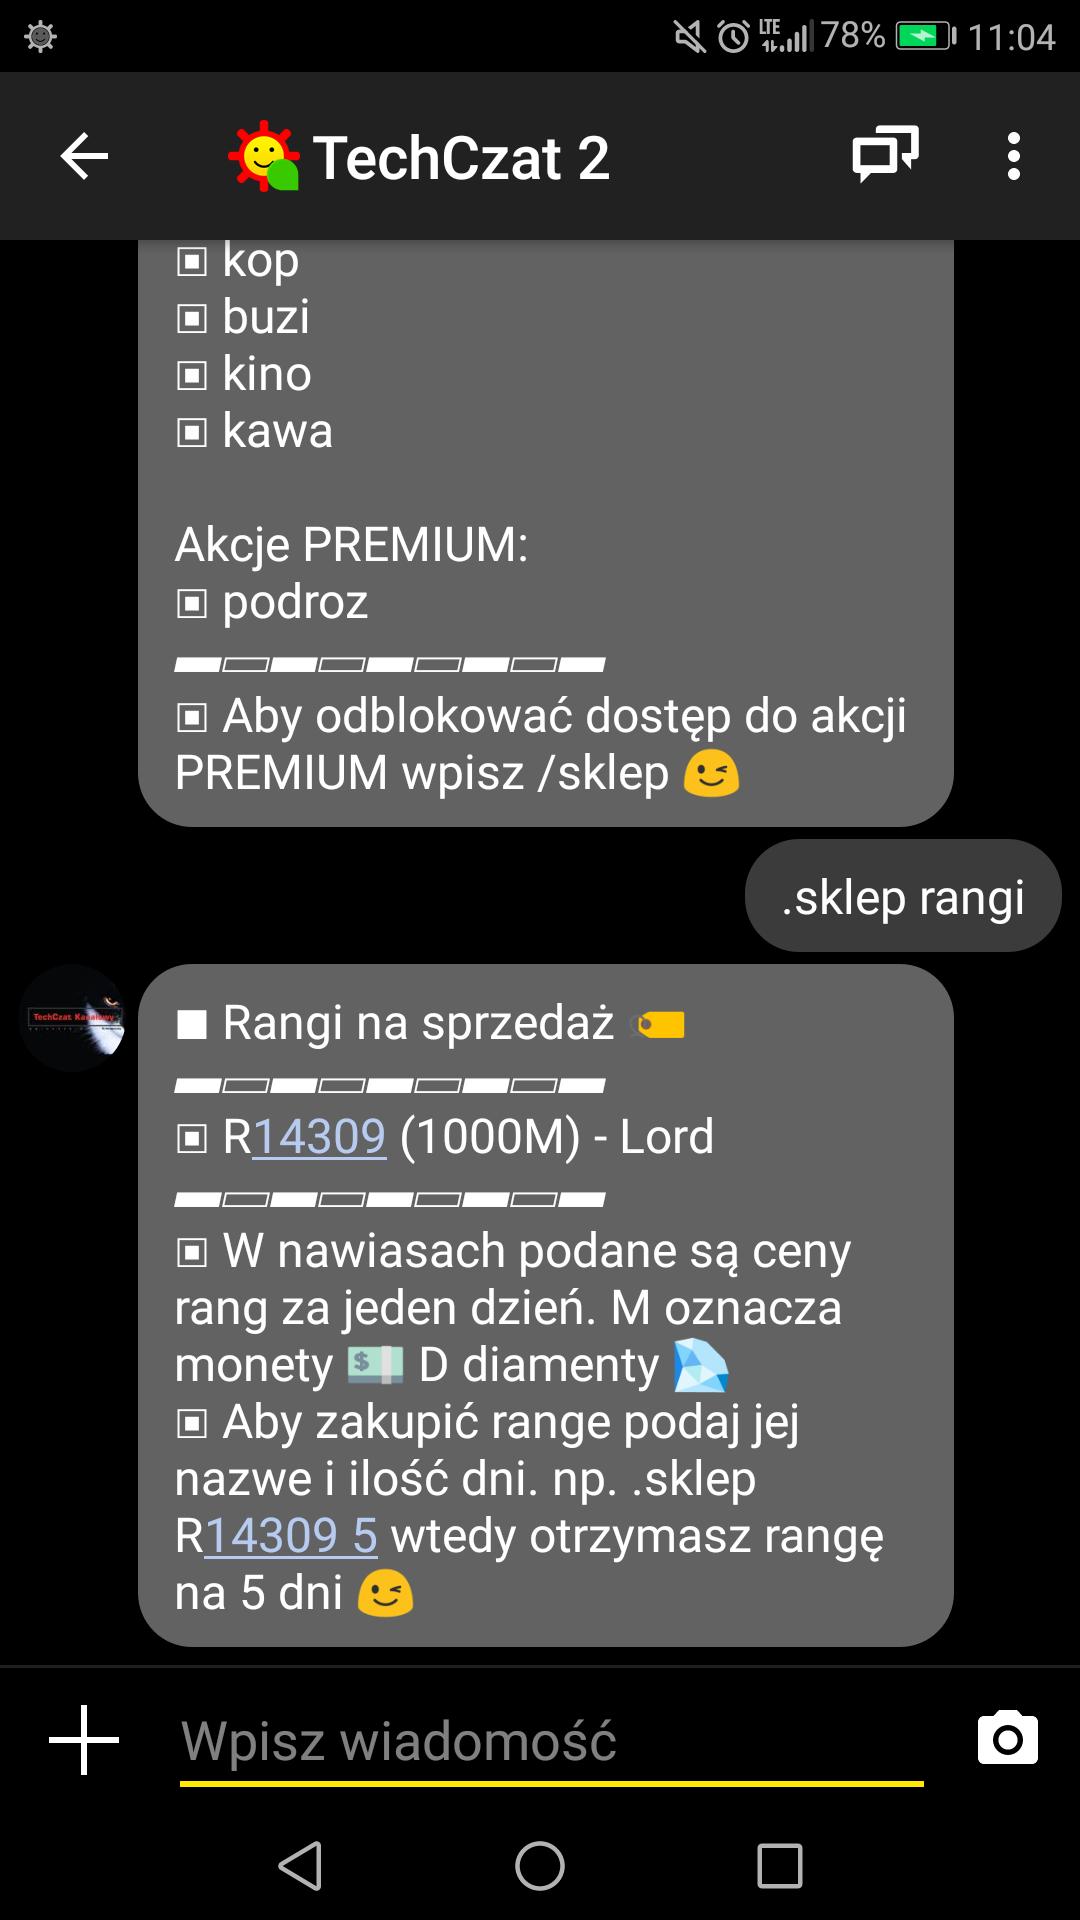 Screenshot_20181103-110411.png